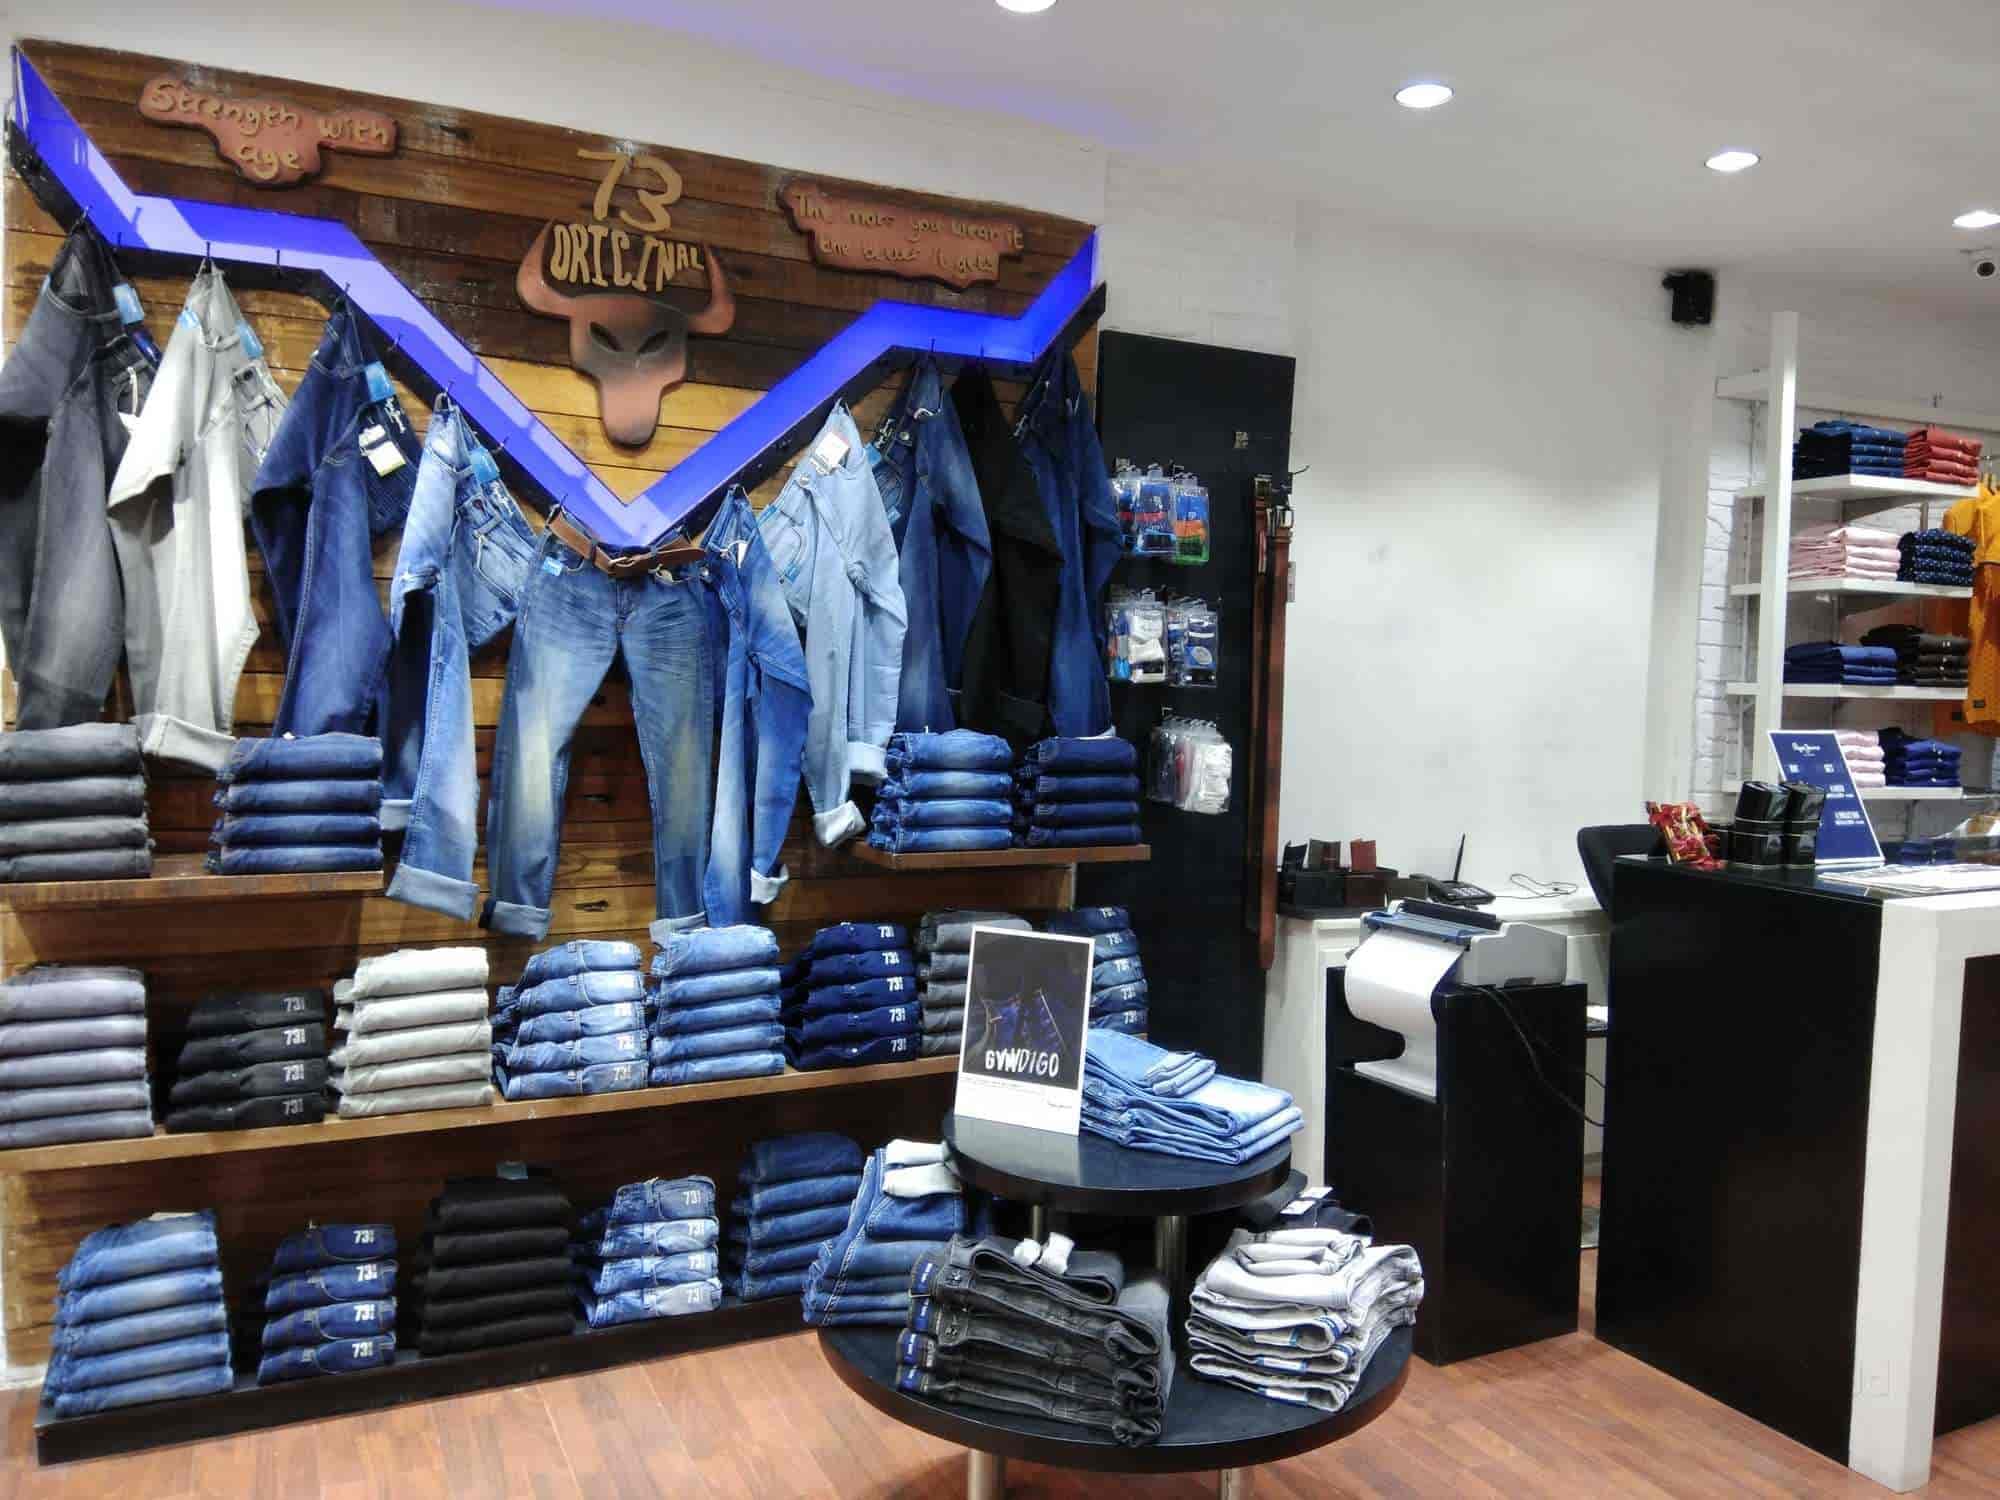 ben noto prezzo folle super popolare Pepe Jeans London (Closed Down) in Kankarbagh, Patna - Justdial